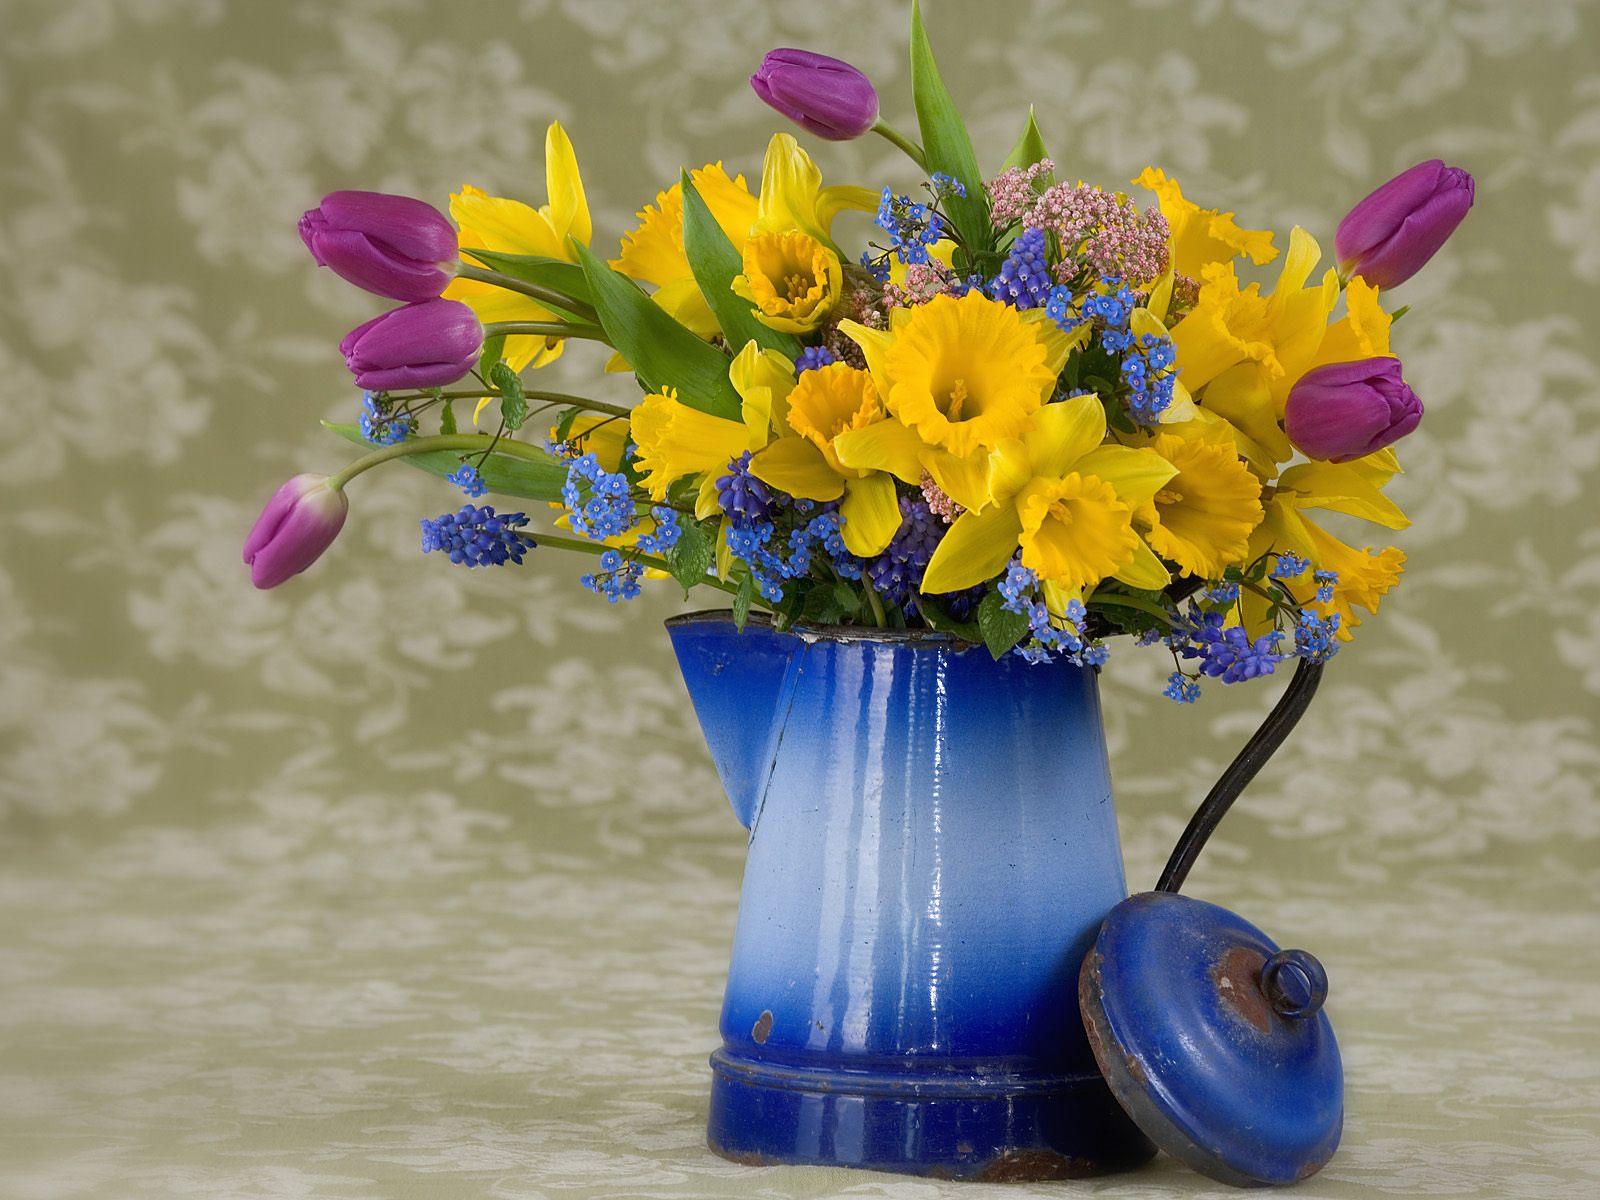 72] Spring Flower Wallpaper on WallpaperSafari 1600x1200